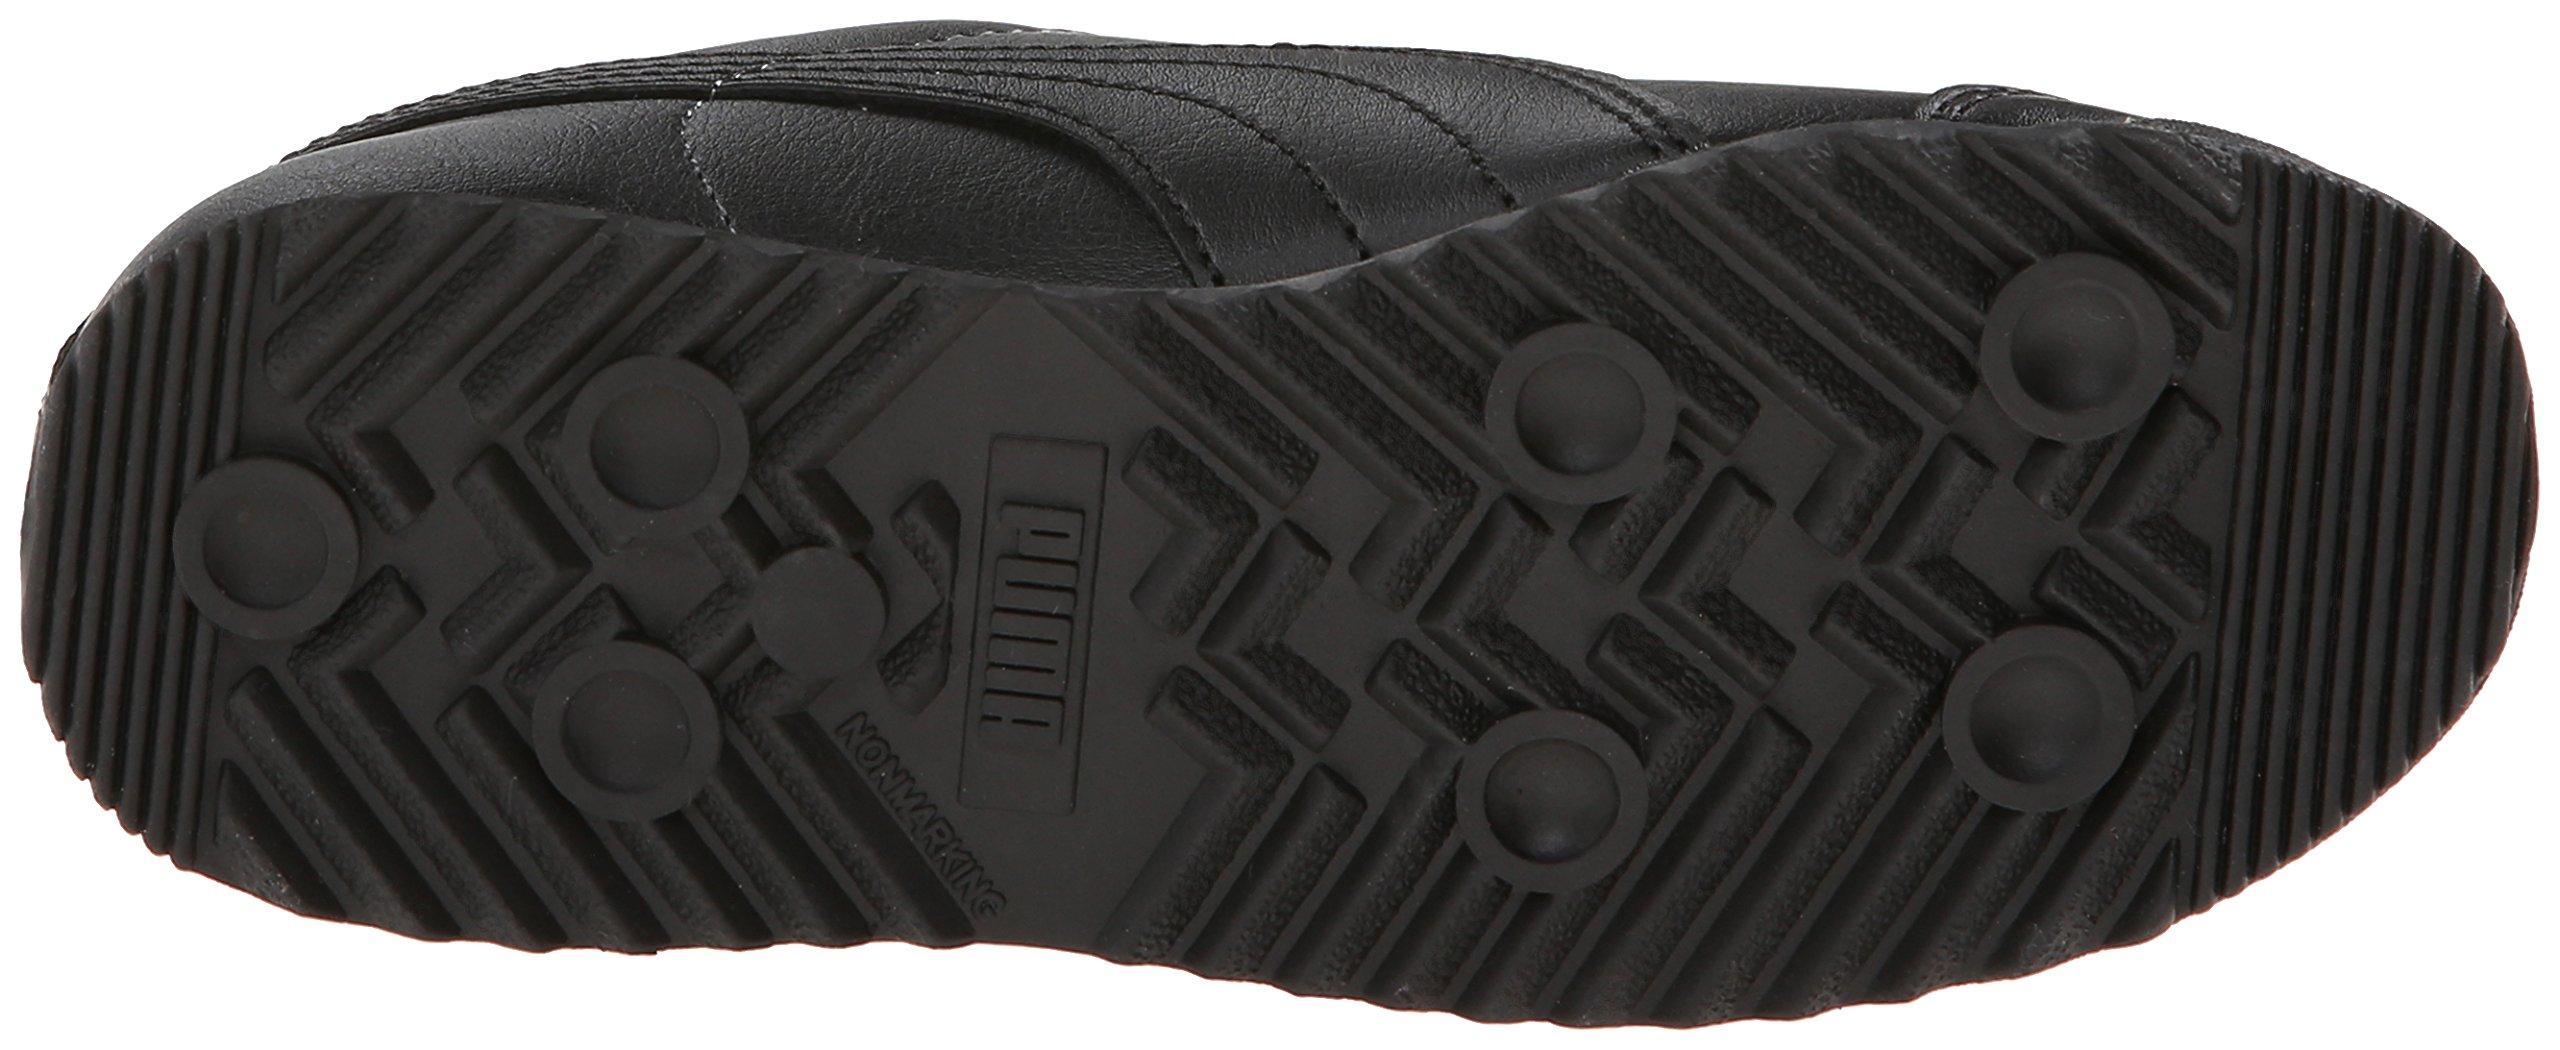 PUMA Roma Basic JR Sneaker , Black/Black, 1 M US Little Kid by PUMA (Image #3)